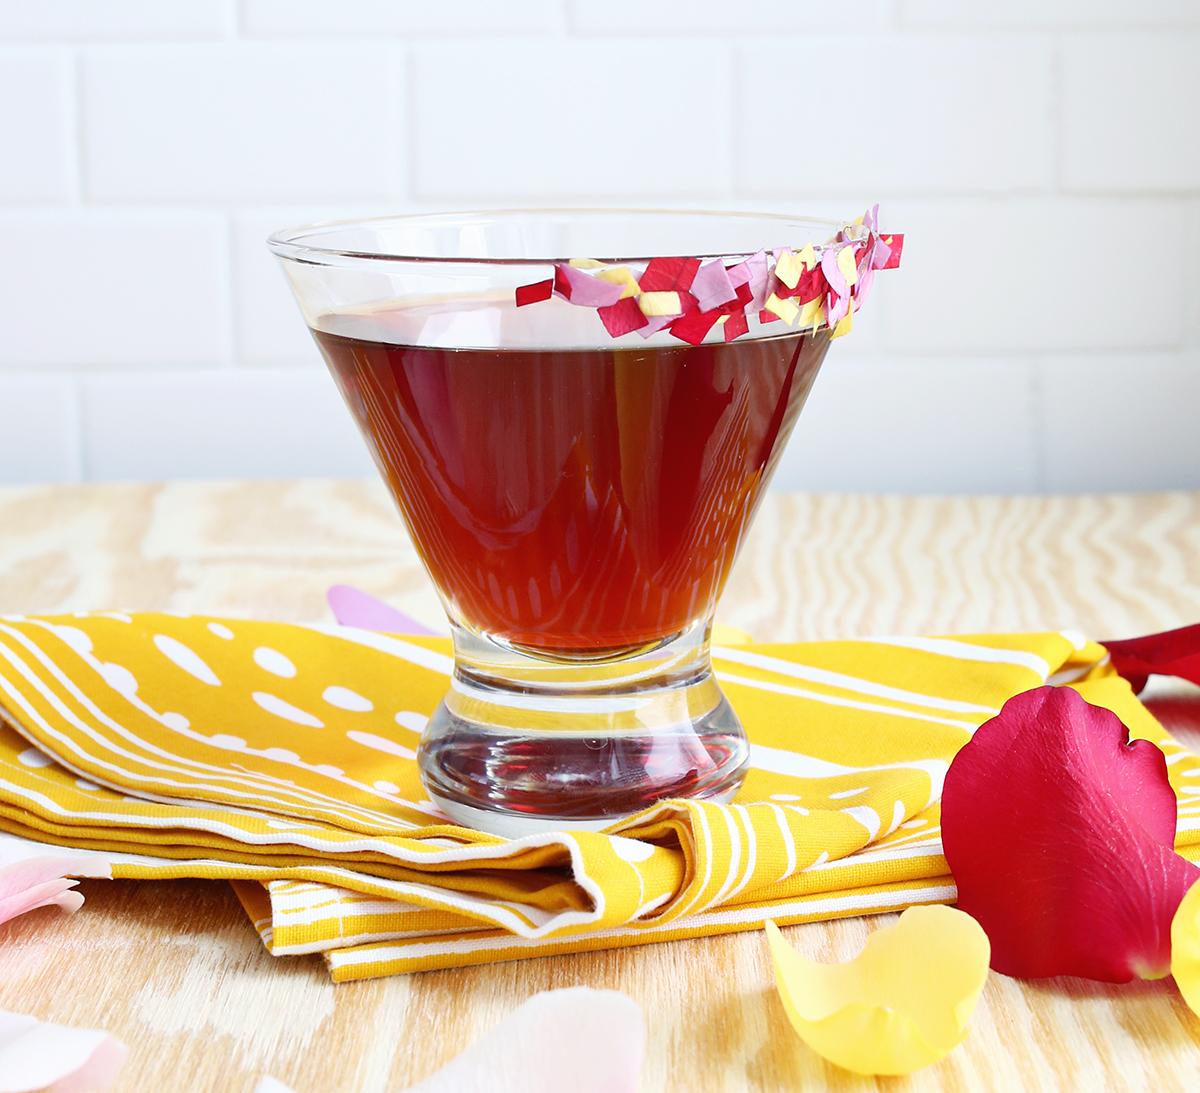 Rose Pomegranate Martini (click through for the full recipe!)